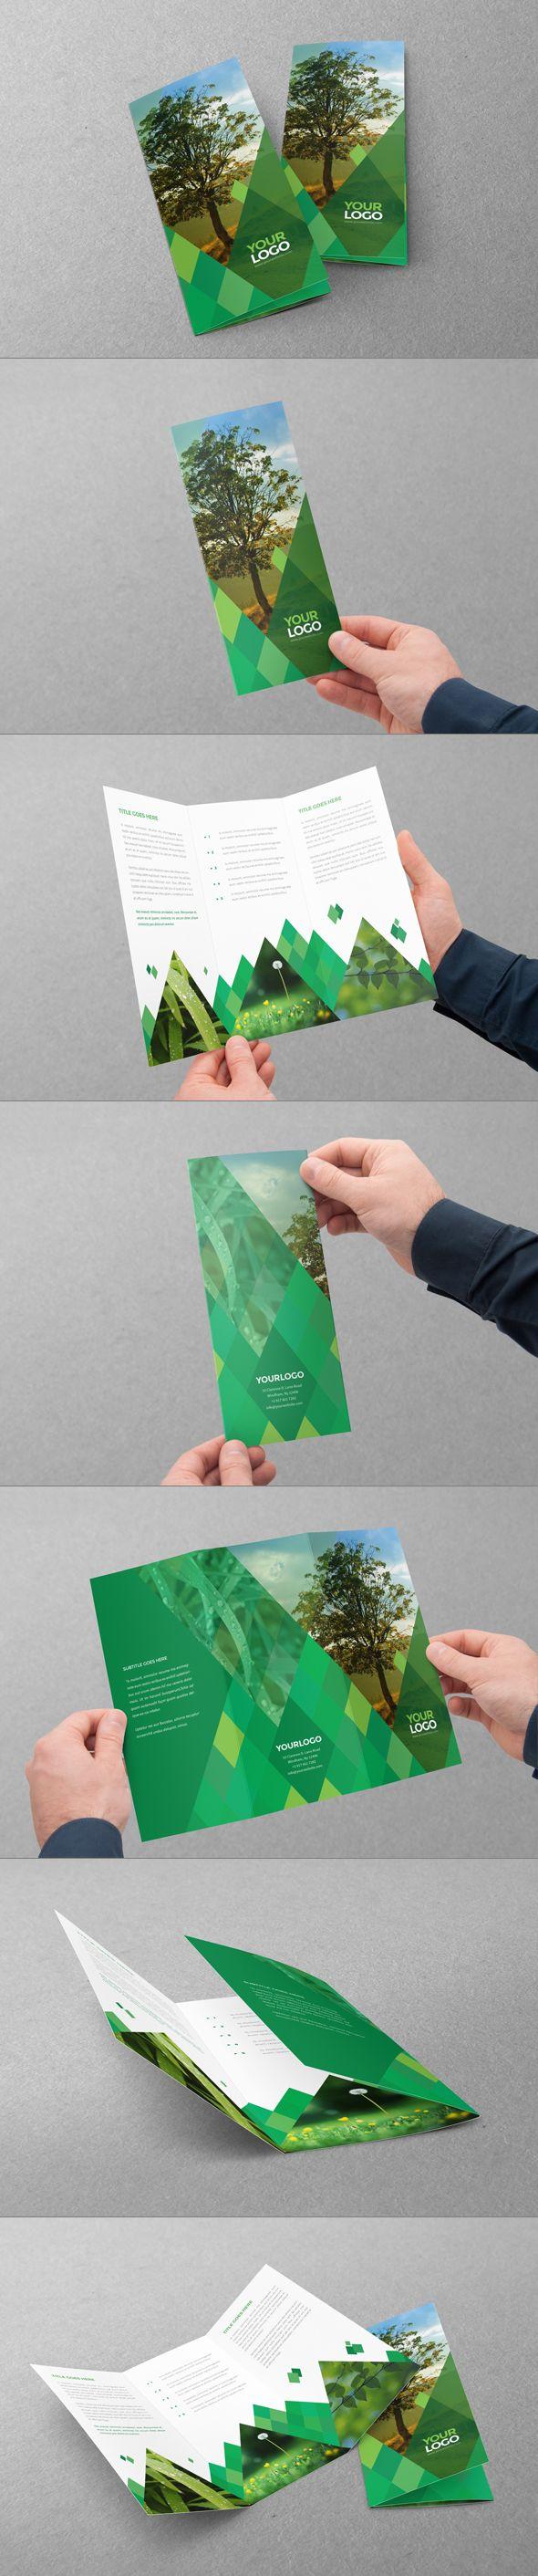 Green Diamonds Trifold by Abra Design